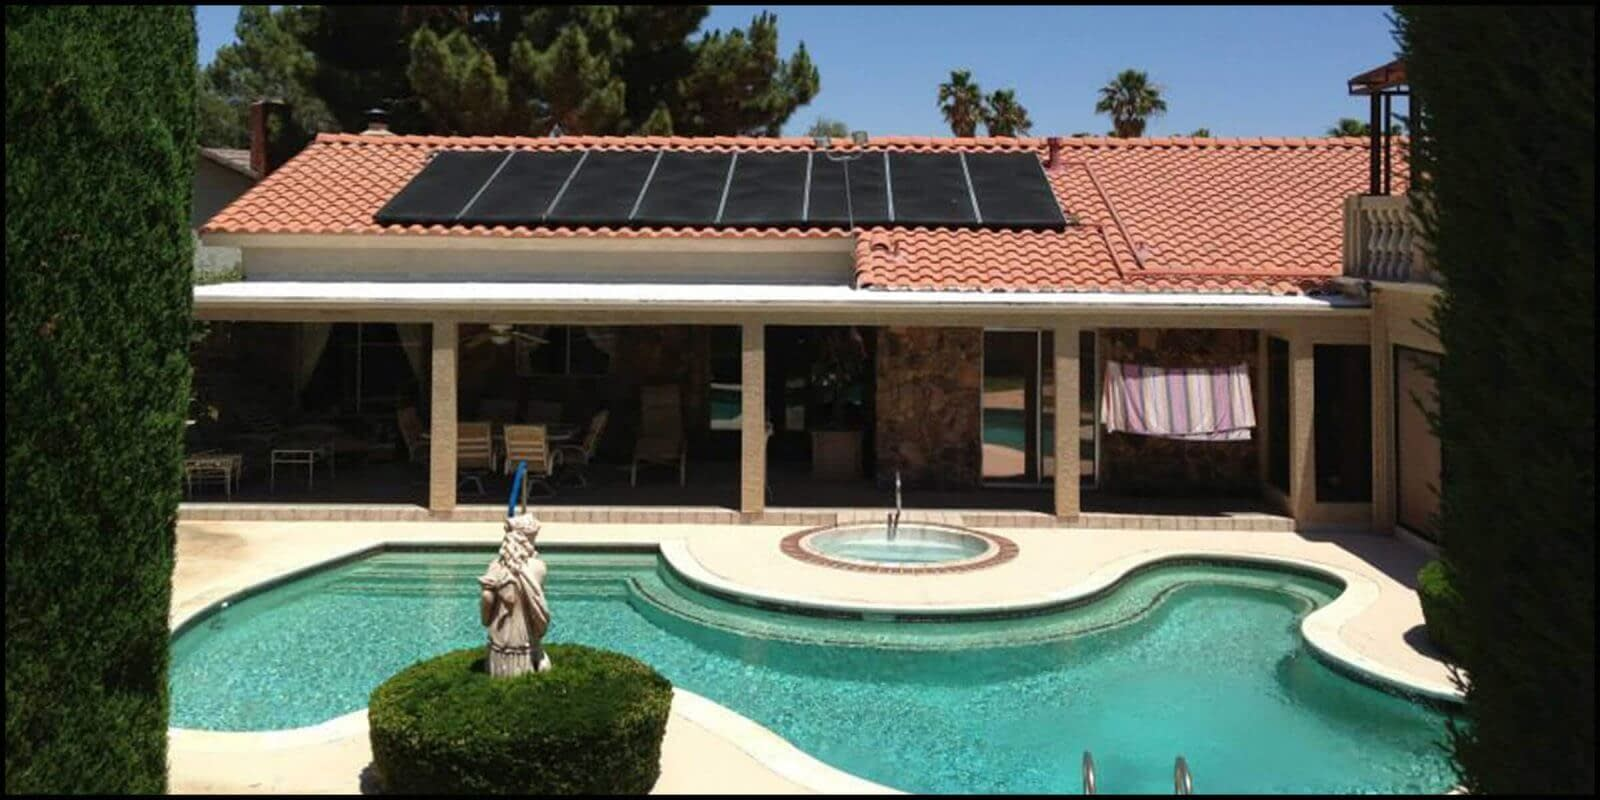 celestial solar pool heating